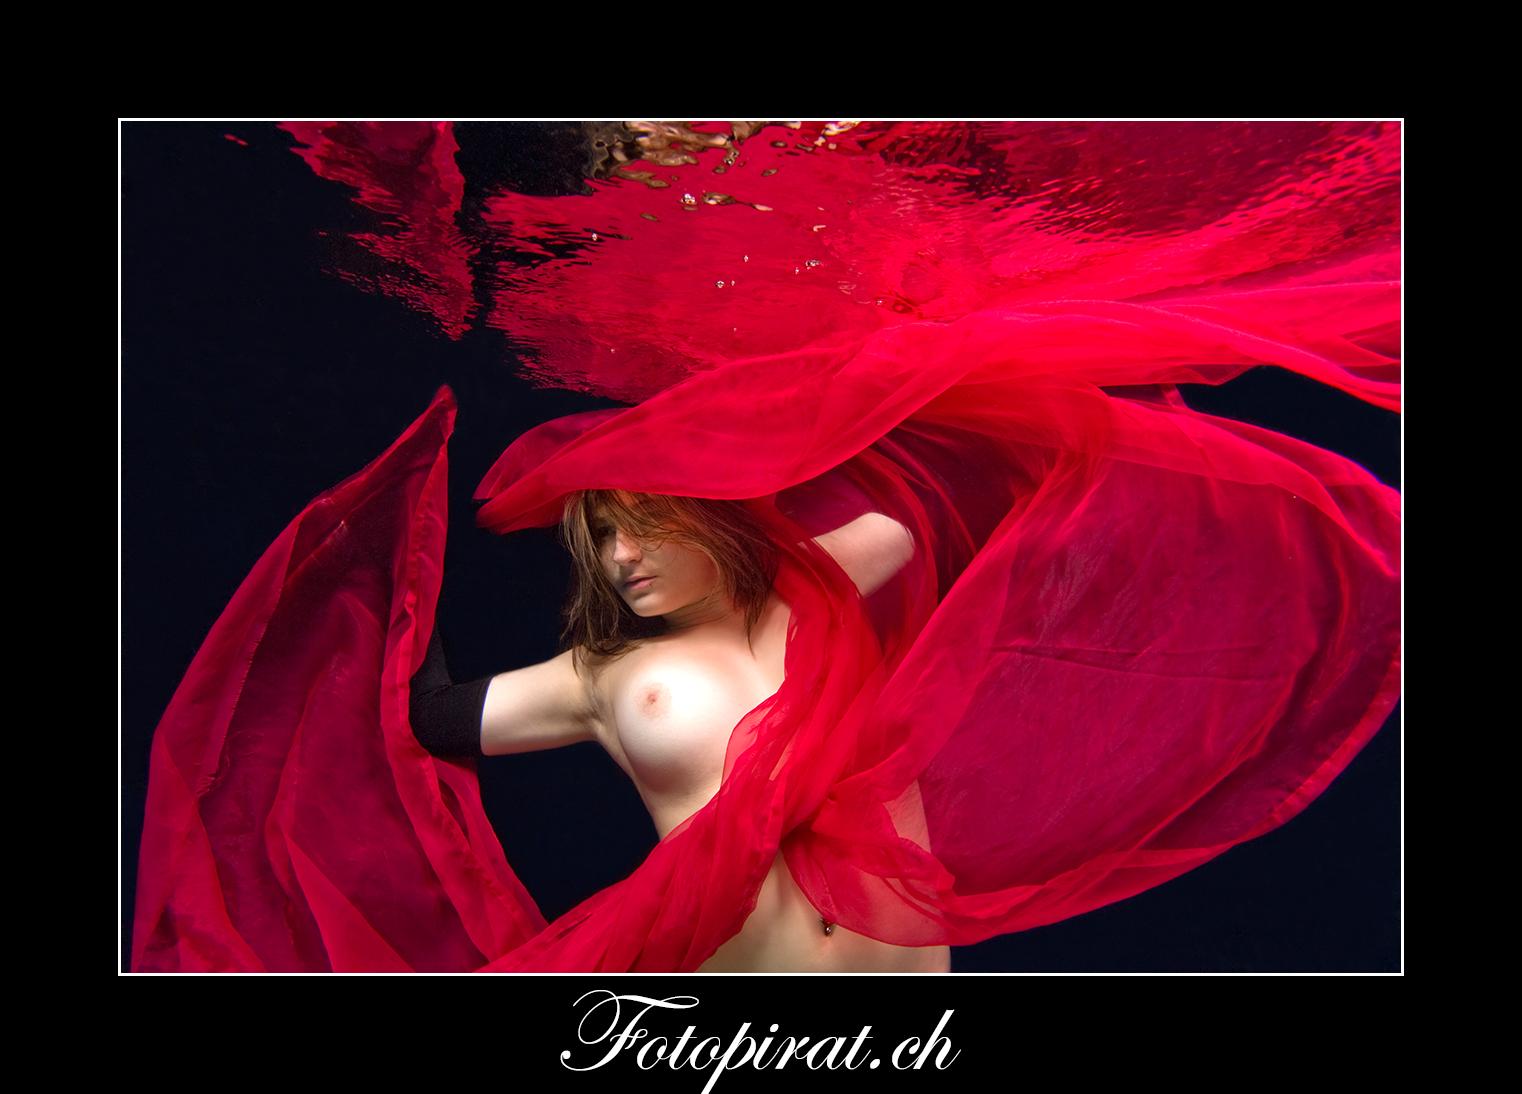 Fotoshooting, Fotostudio, Akt, Nackt, Nudeart, Nude, Modelagentur, Fotomodel, erotik, grosse Brüste, Unterwasser Fotoshooting